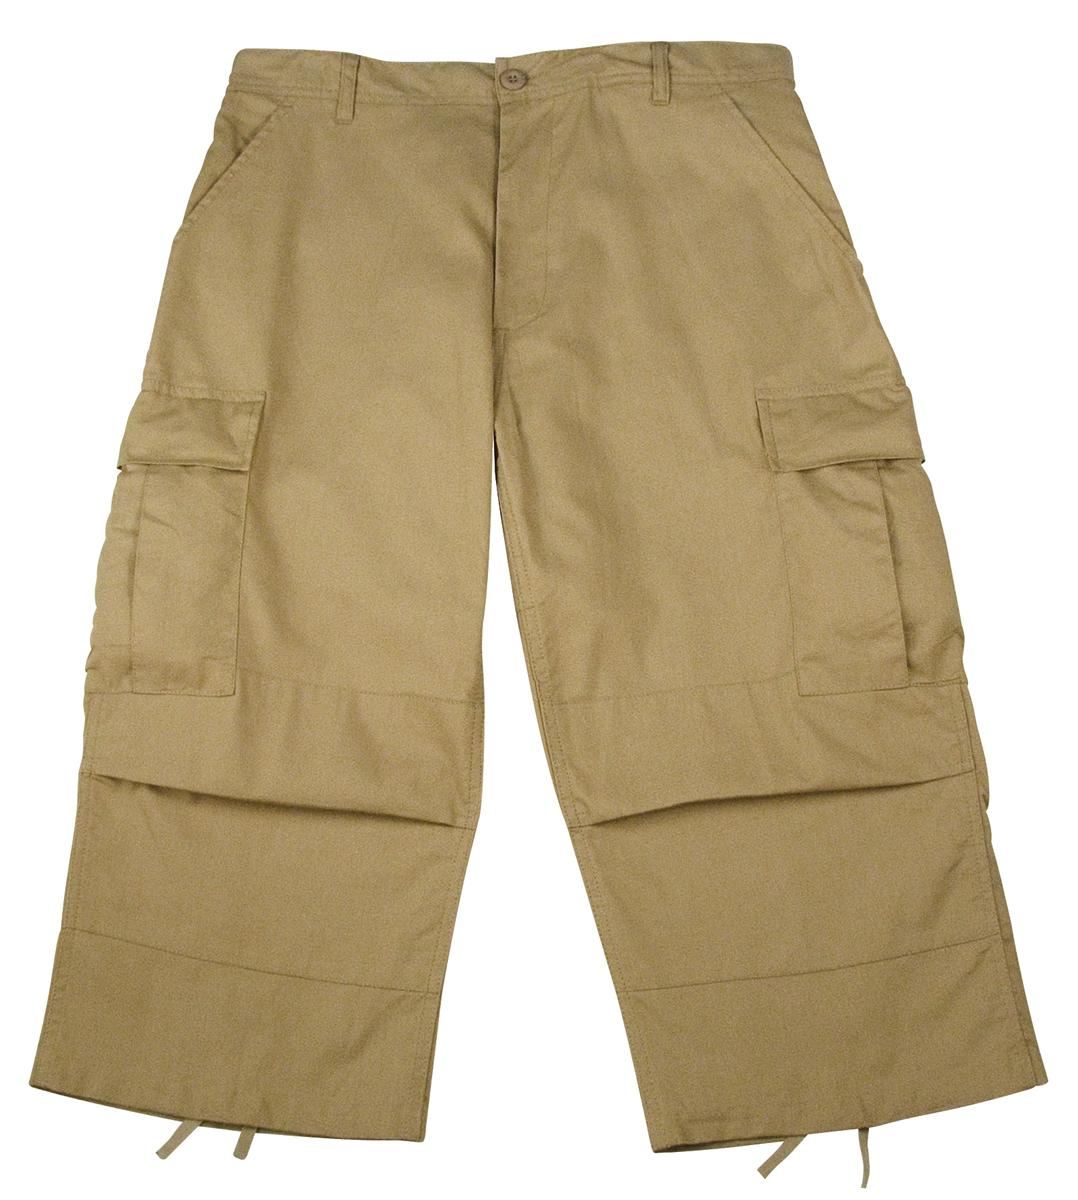 Mens Khaki Cropped Capri Pants w/Cargo Pockets | eBay